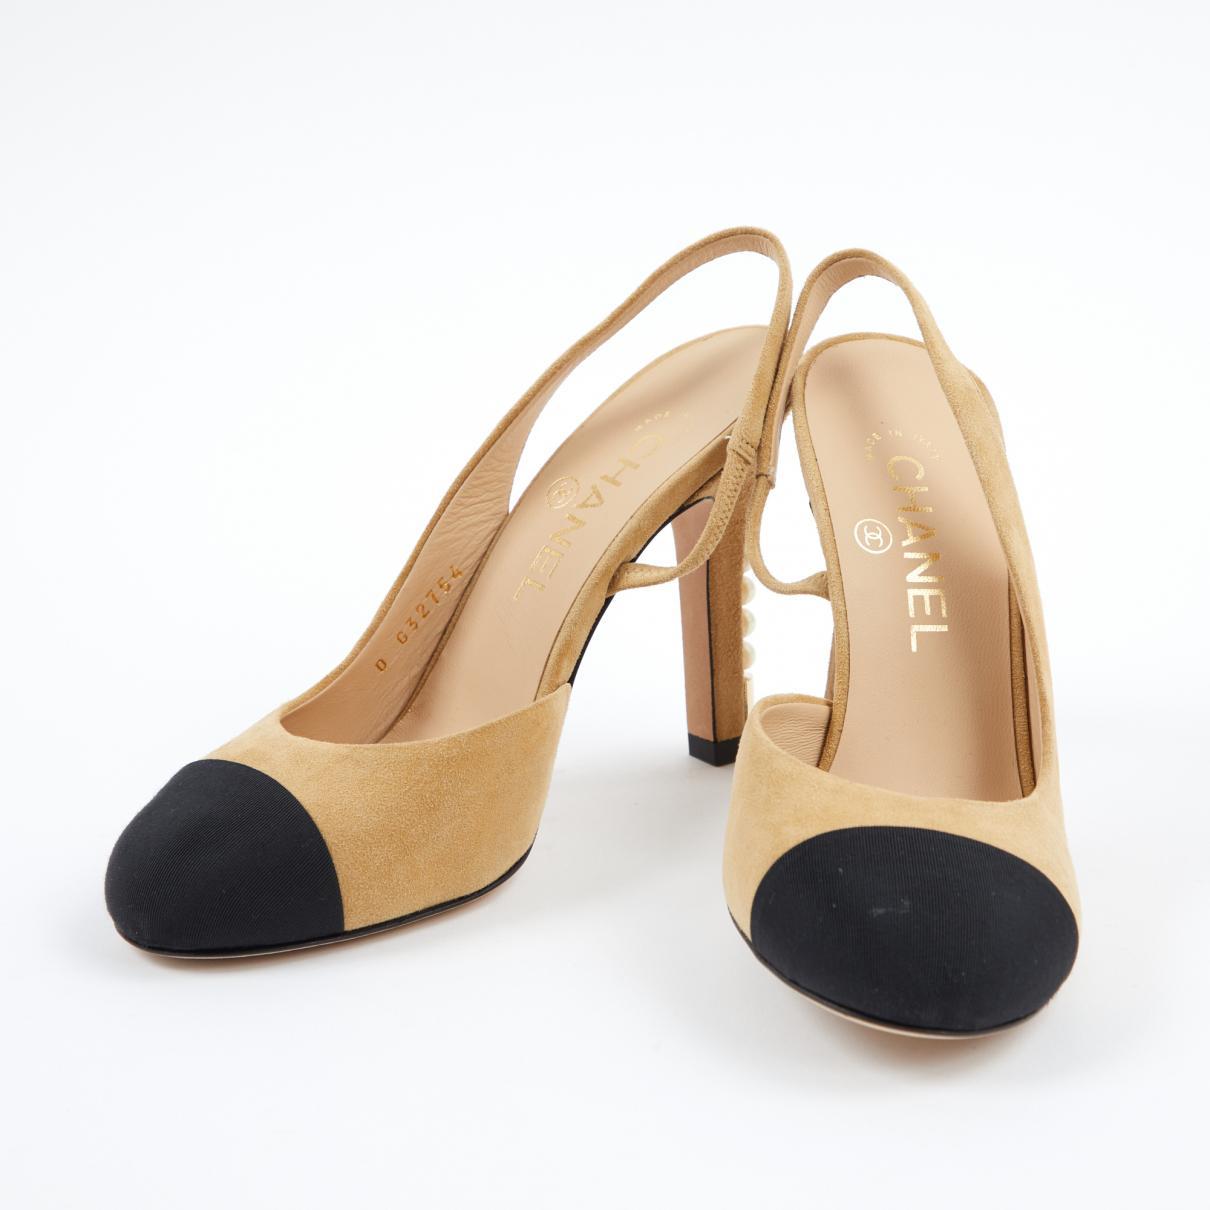 16c2e798314 Chanel - Natural Slingback Heels - Lyst. View fullscreen